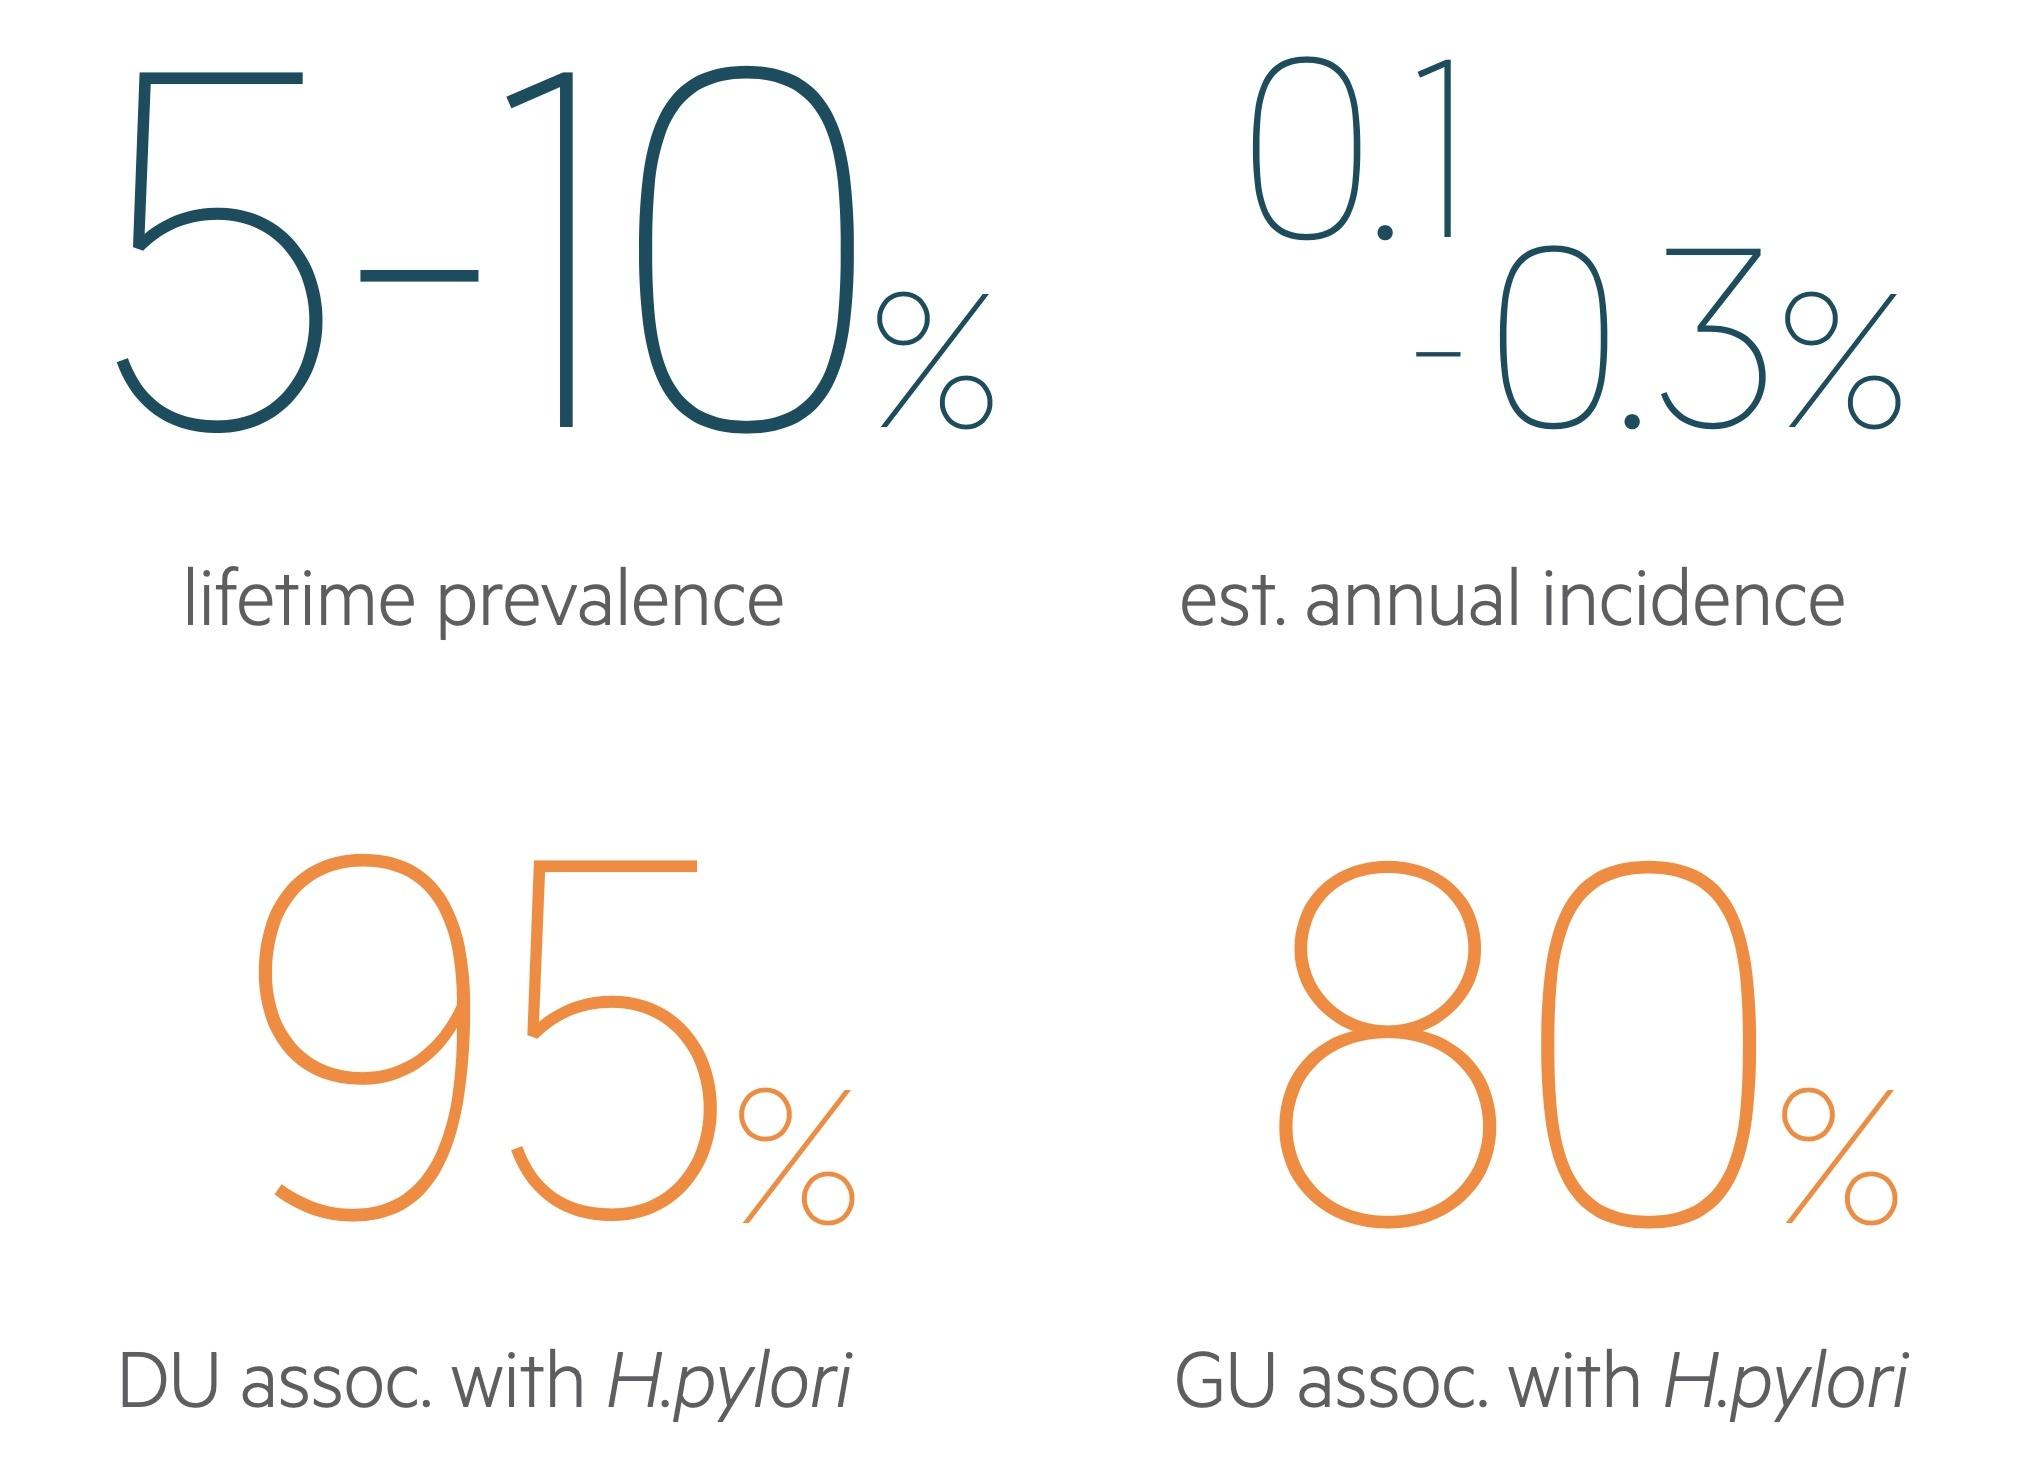 Peptic ulcer disease (PUD) statistics